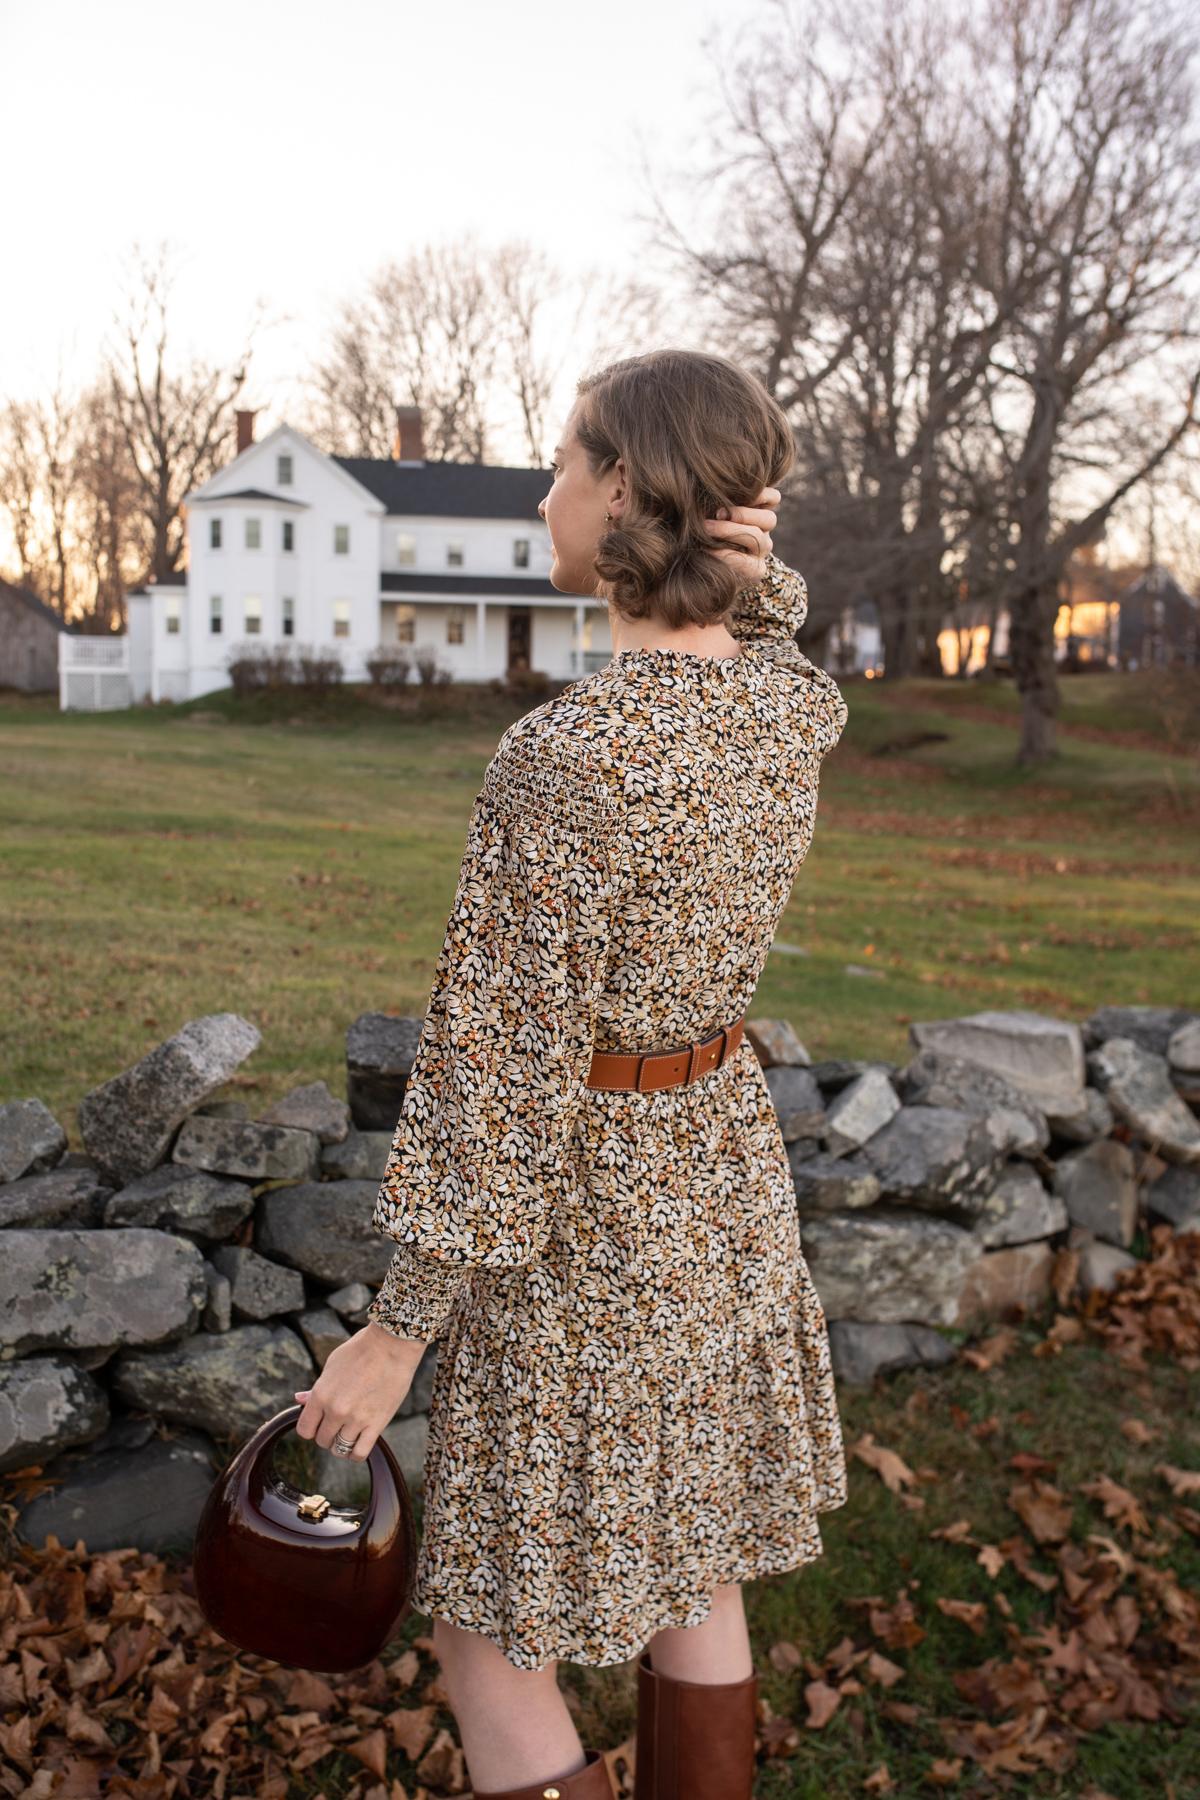 Stacie Flinner x Charlotte Brody Smocked Winterberry Dress-9.jpg